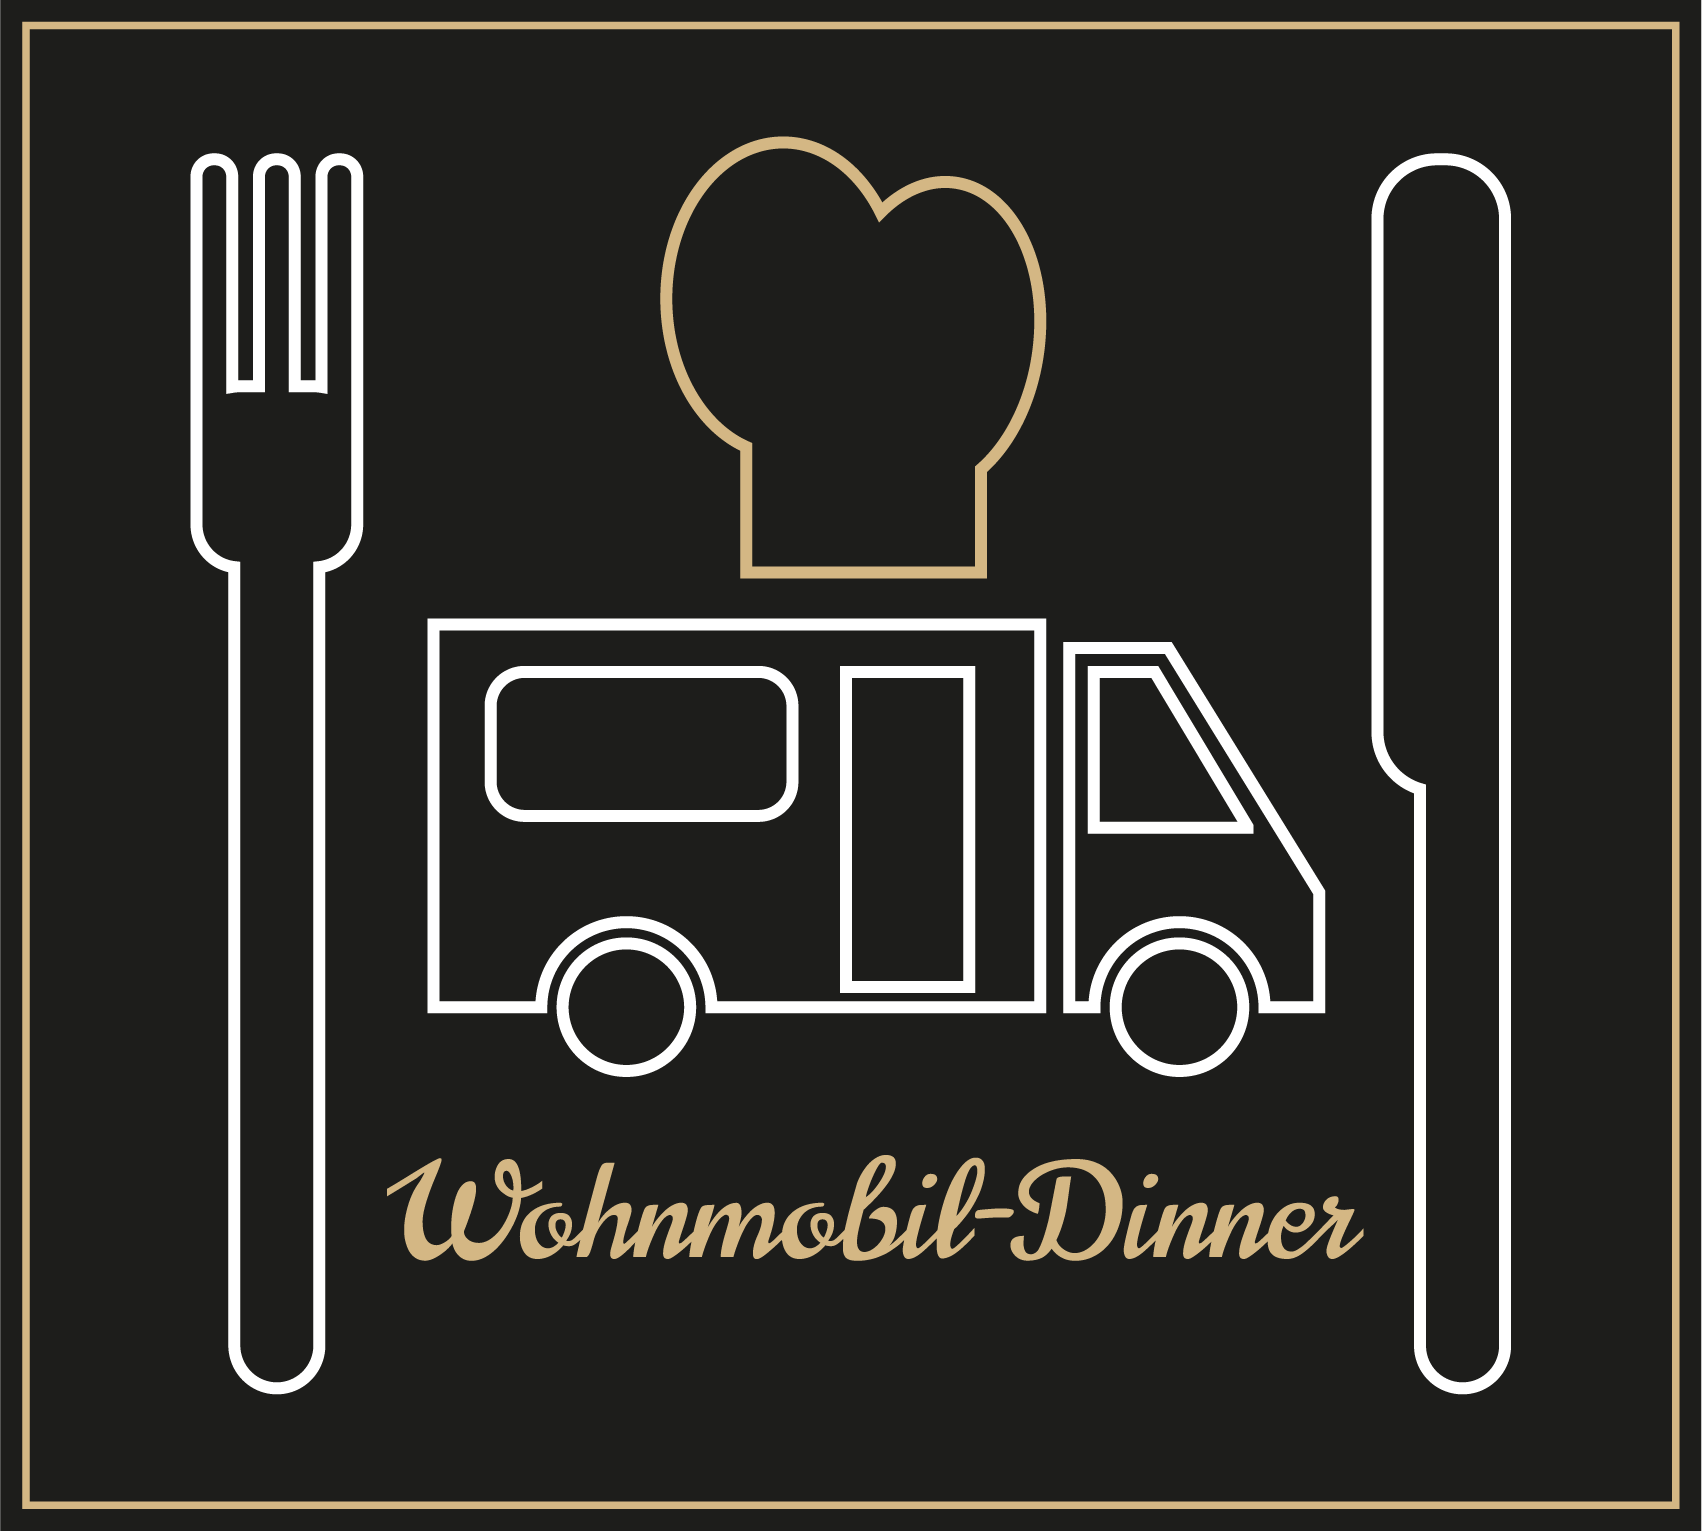 Ochsen Post -Wohnmobil-Dinner